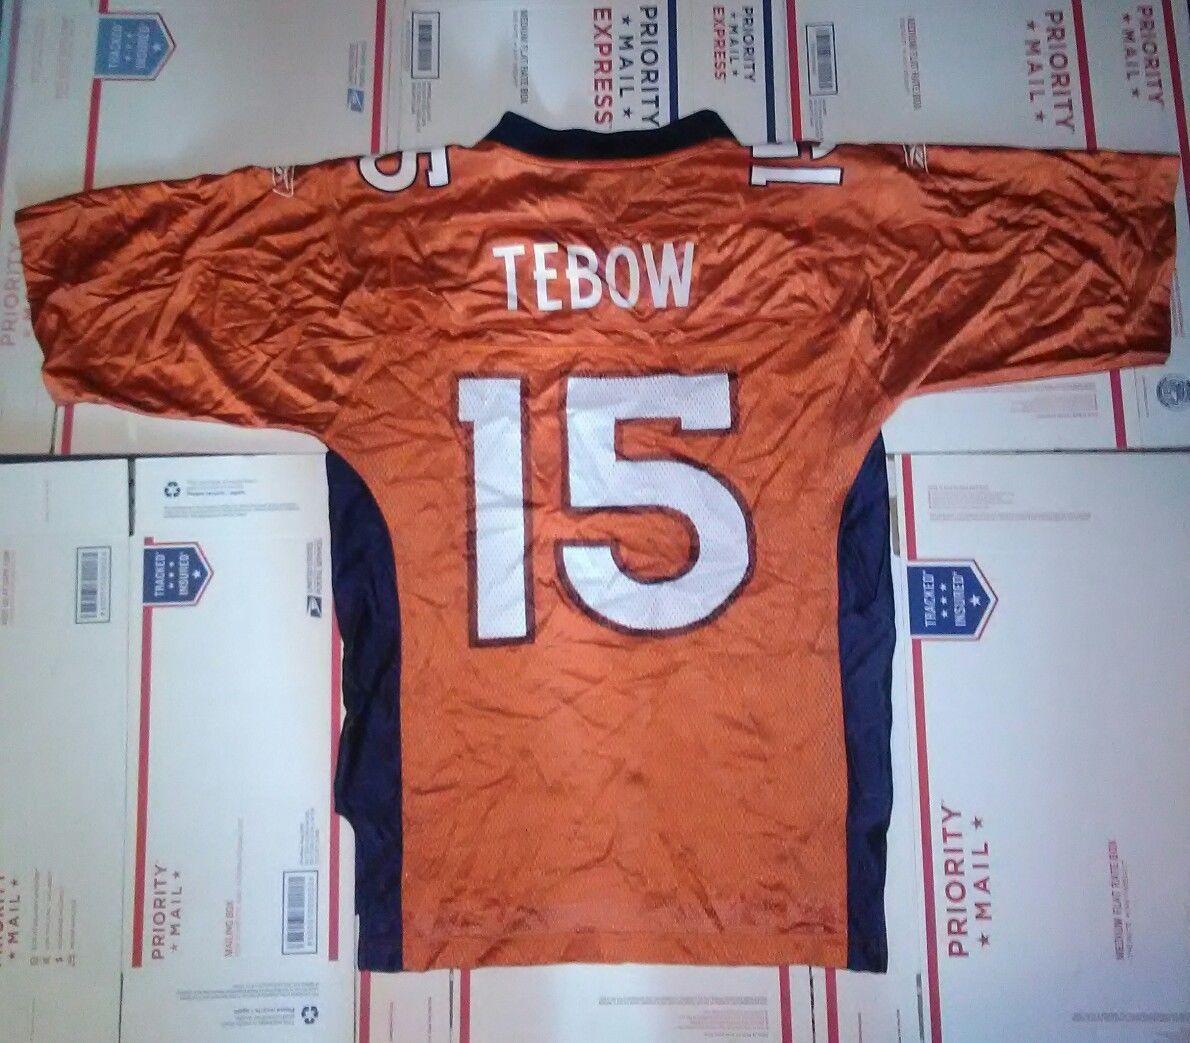 wholesale dealer a086d 86dfb NFL-DENVER BRONCOS- #15 Tim Tebow JERSEY- and 50 similar items